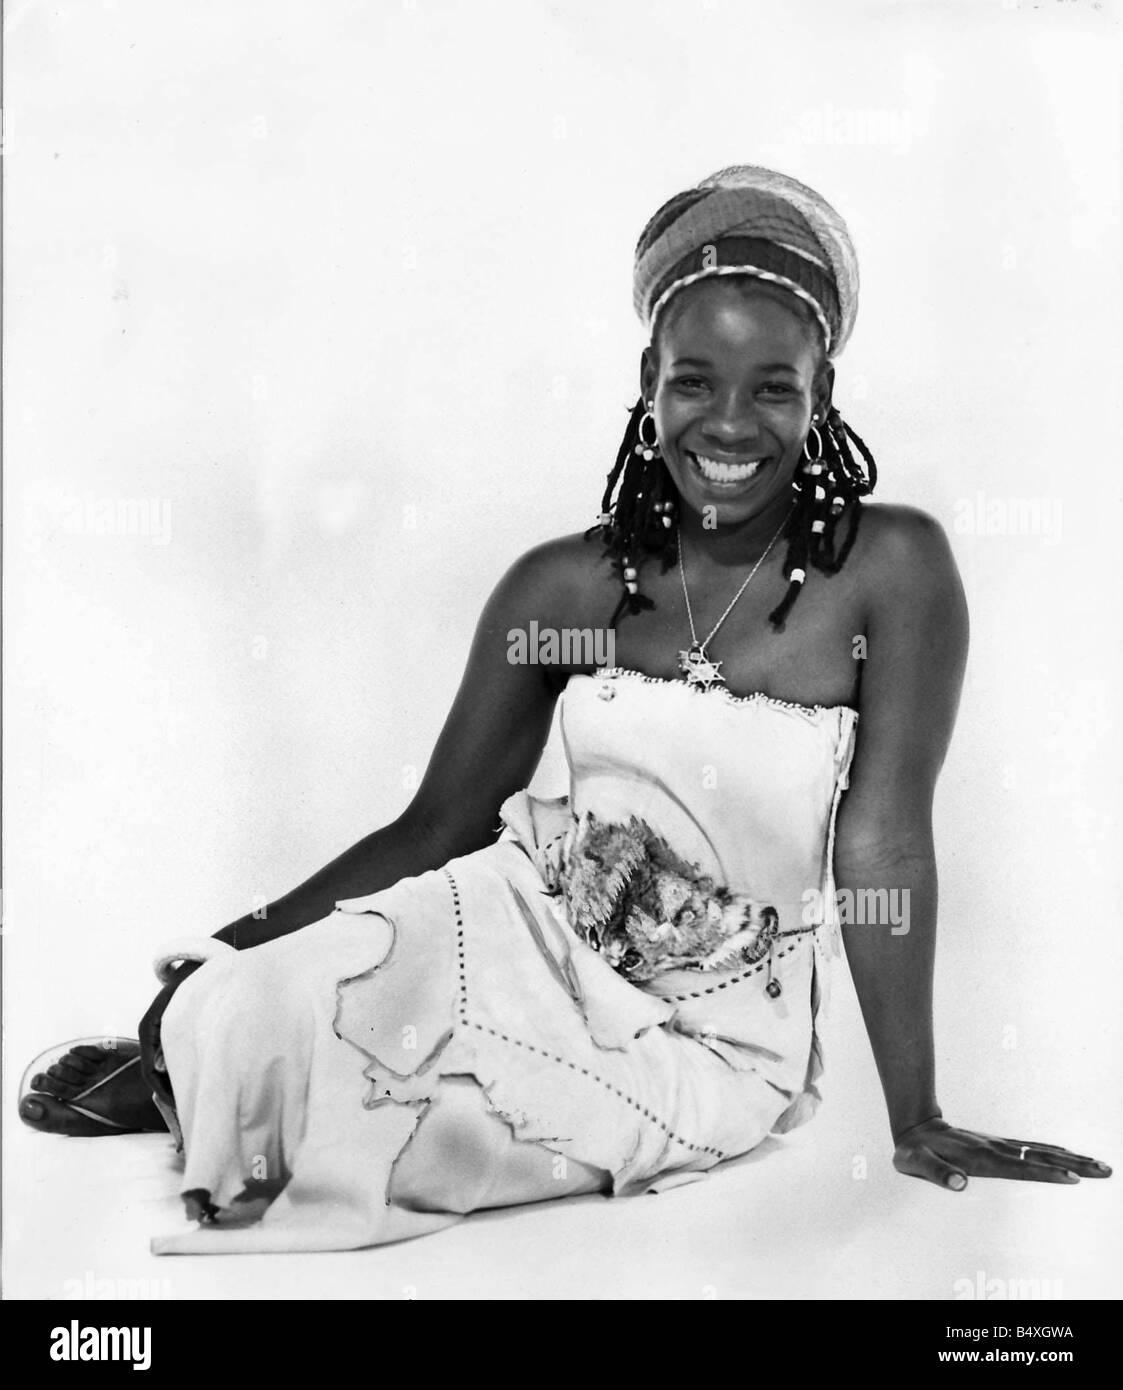 Rita Marley Reggae Singer and wife of Bob Marley - Stock Image